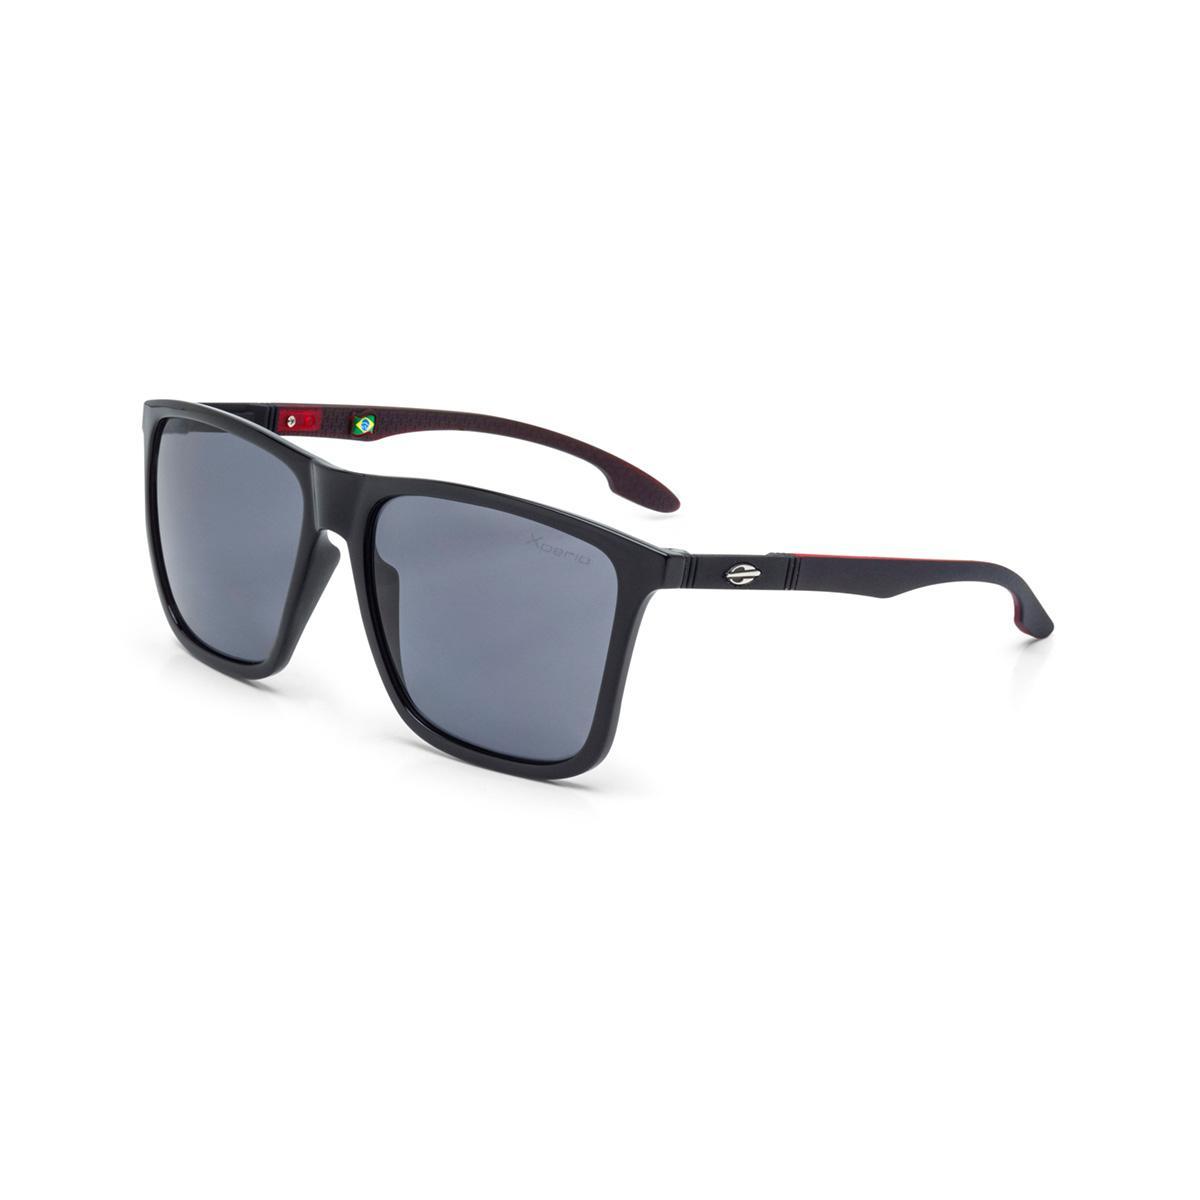 Óculos de Sol Mormaii HAWAII M0034 A18 03 Preto Lente Polarizada Cinza Tam  56 R  369,99 à vista. Adicionar à sacola ebce1256b0